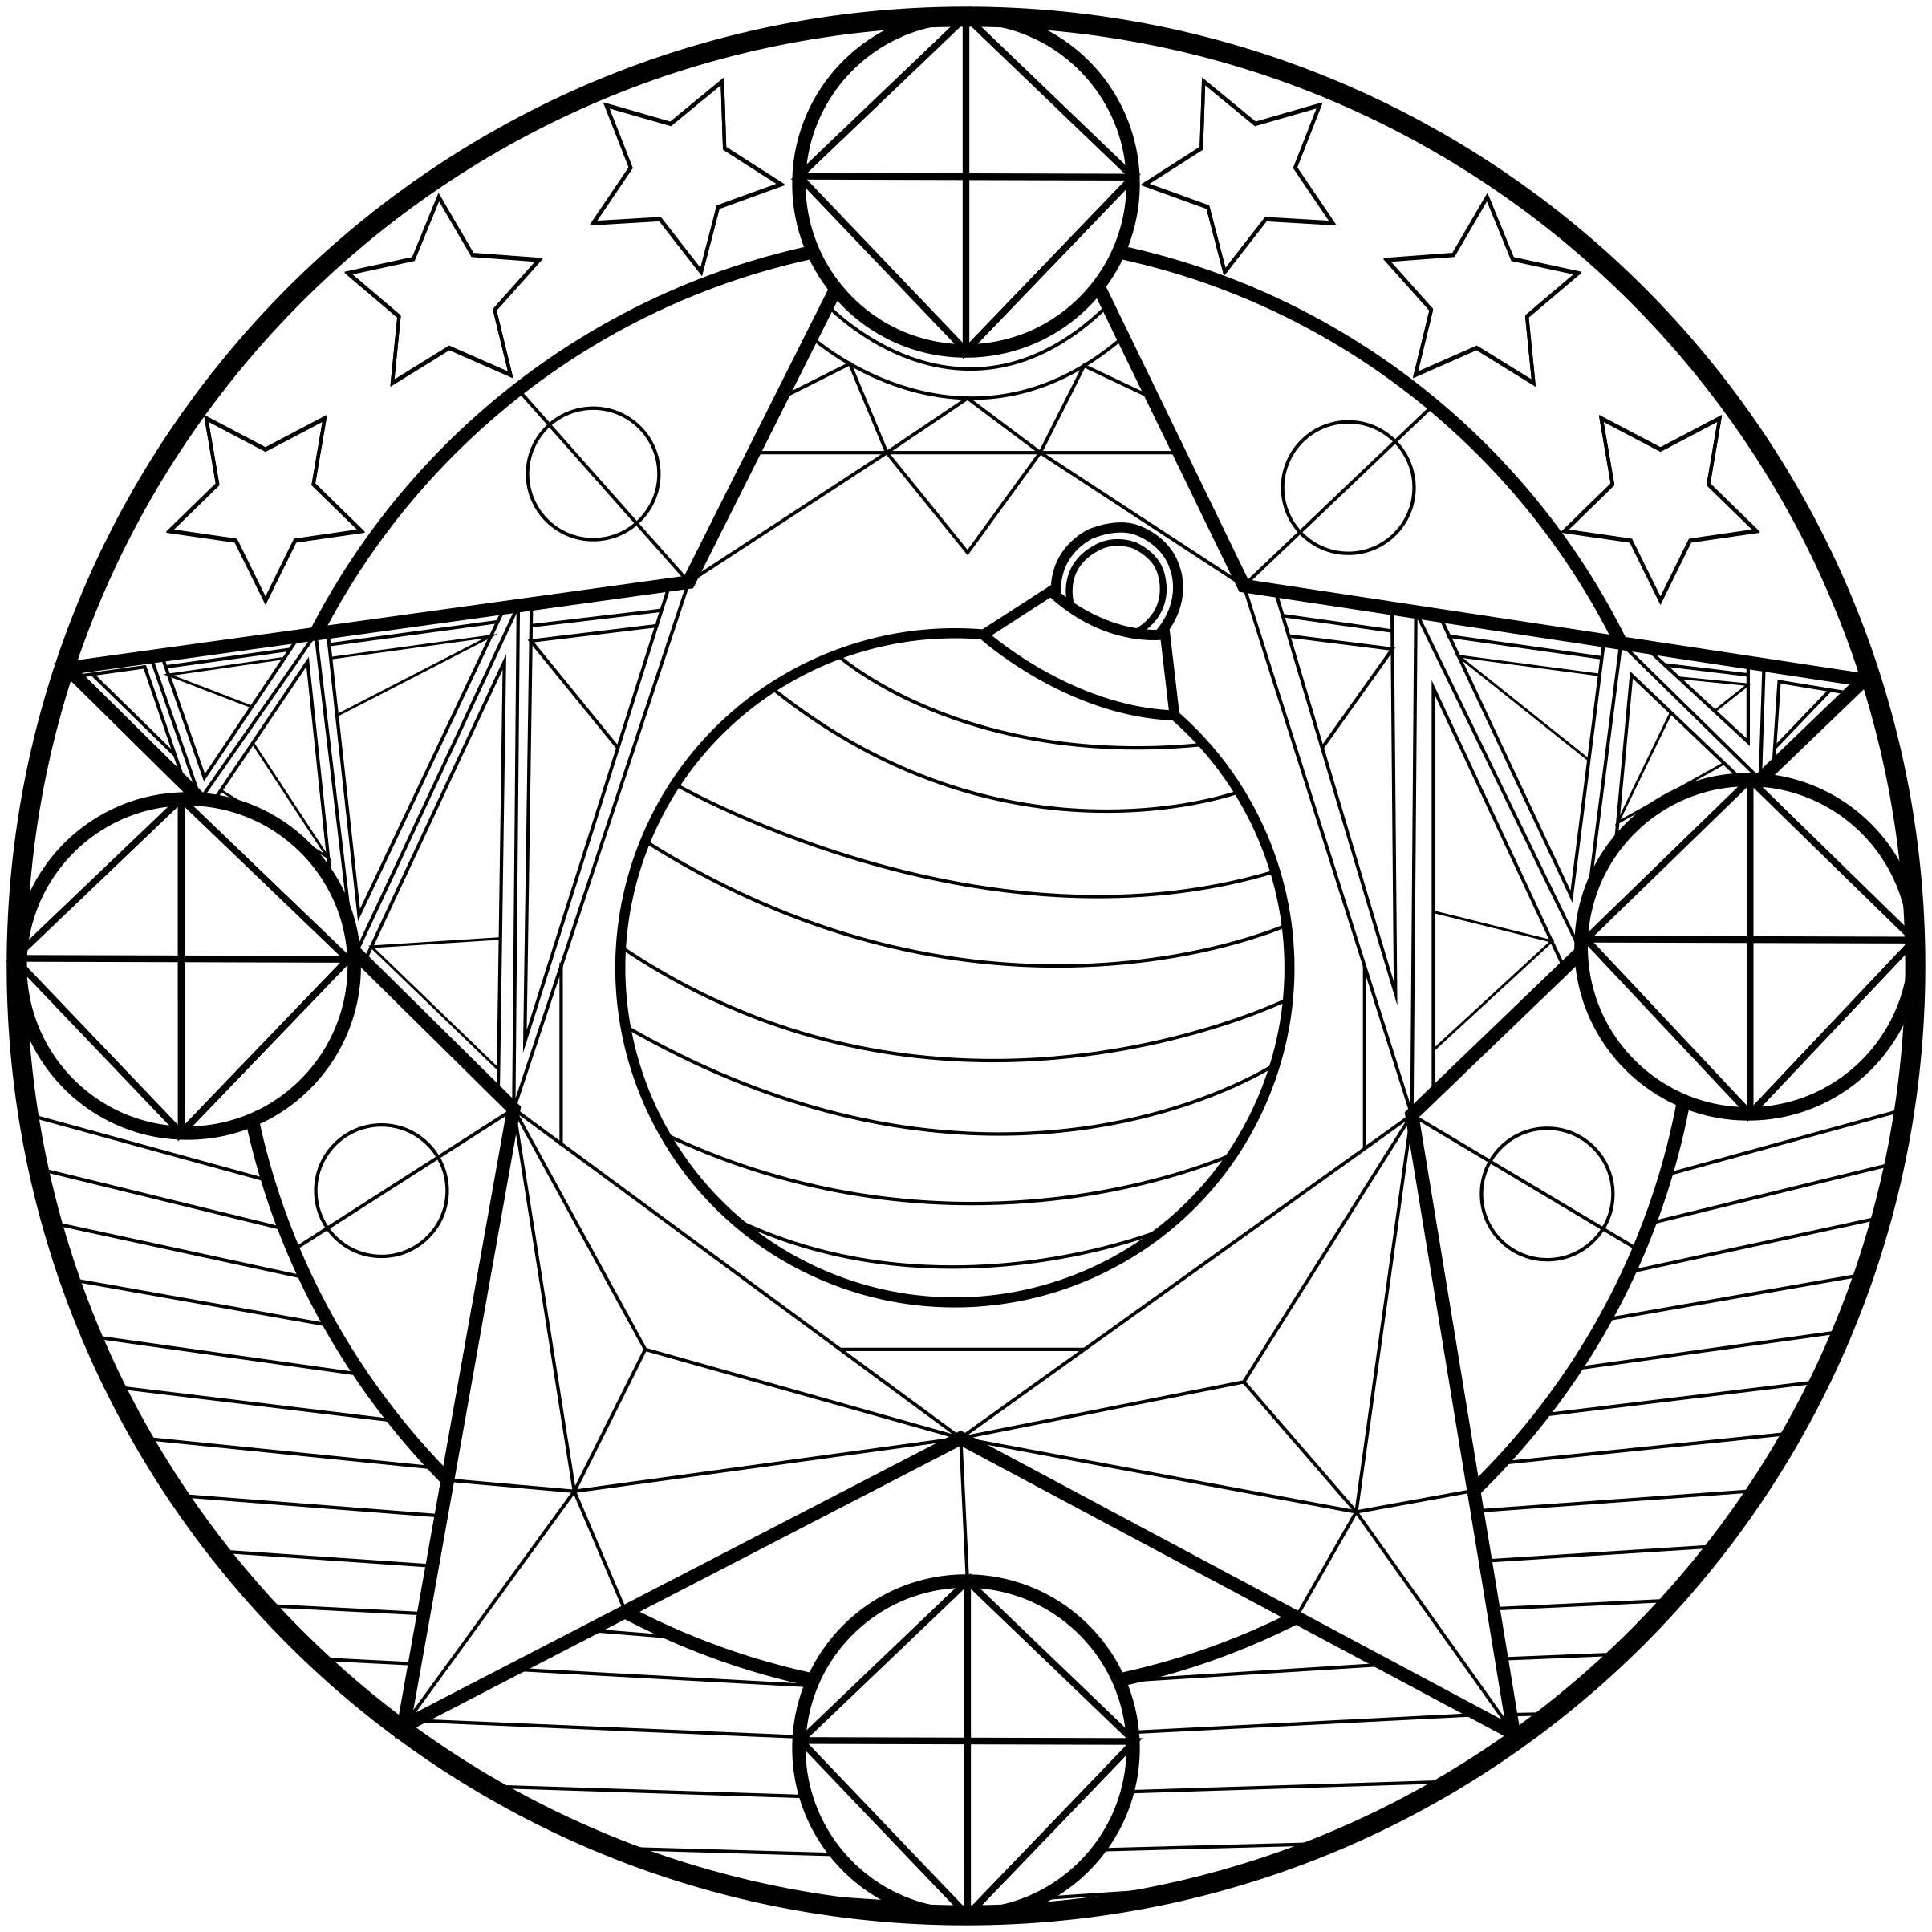 Exclusive Zen & Anti-stress Mandala. Mandala designs increase self-esteem and stimulate aesthetic sense.